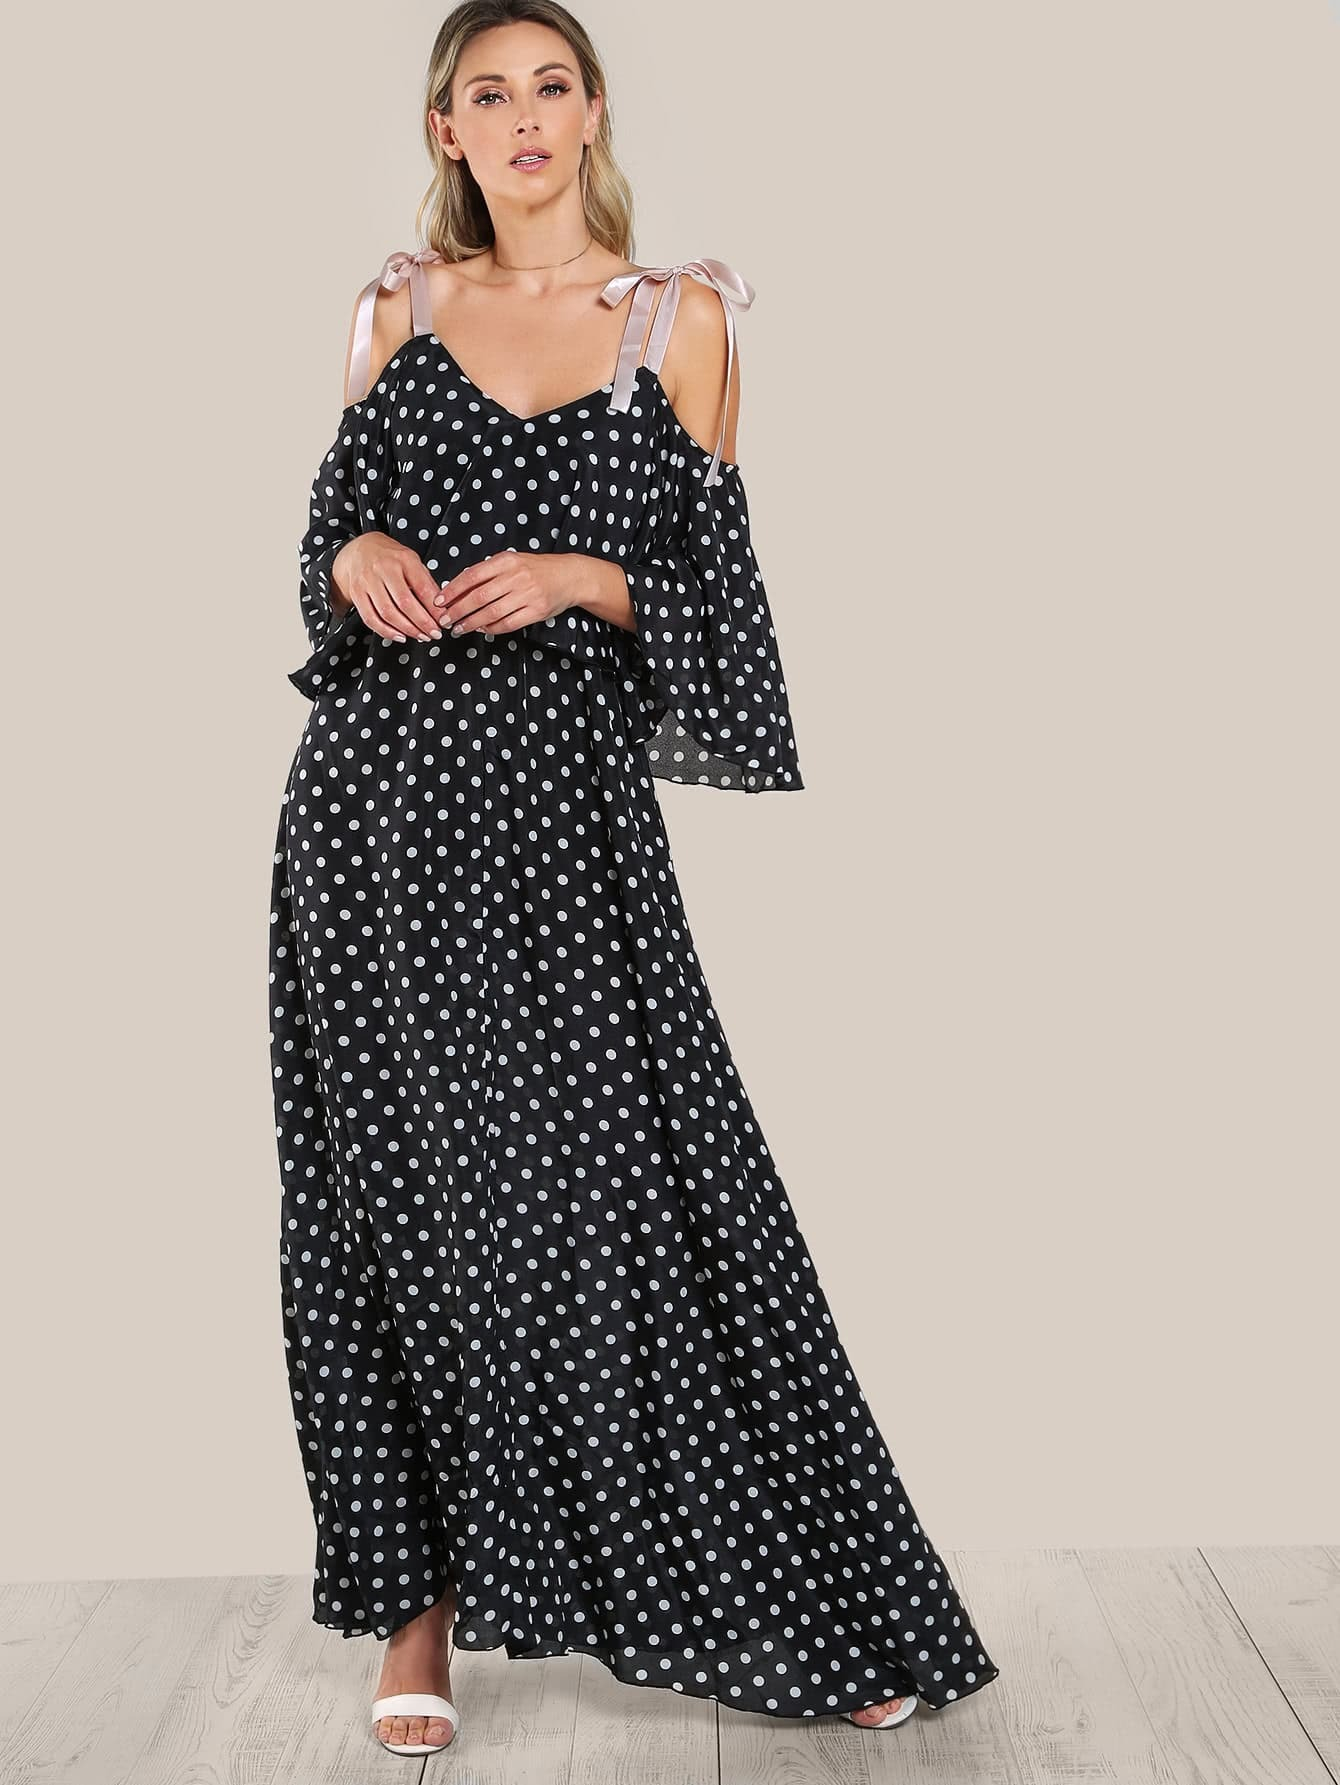 Ribbon Tie Shoulder Double Layer Polka Dot Dress